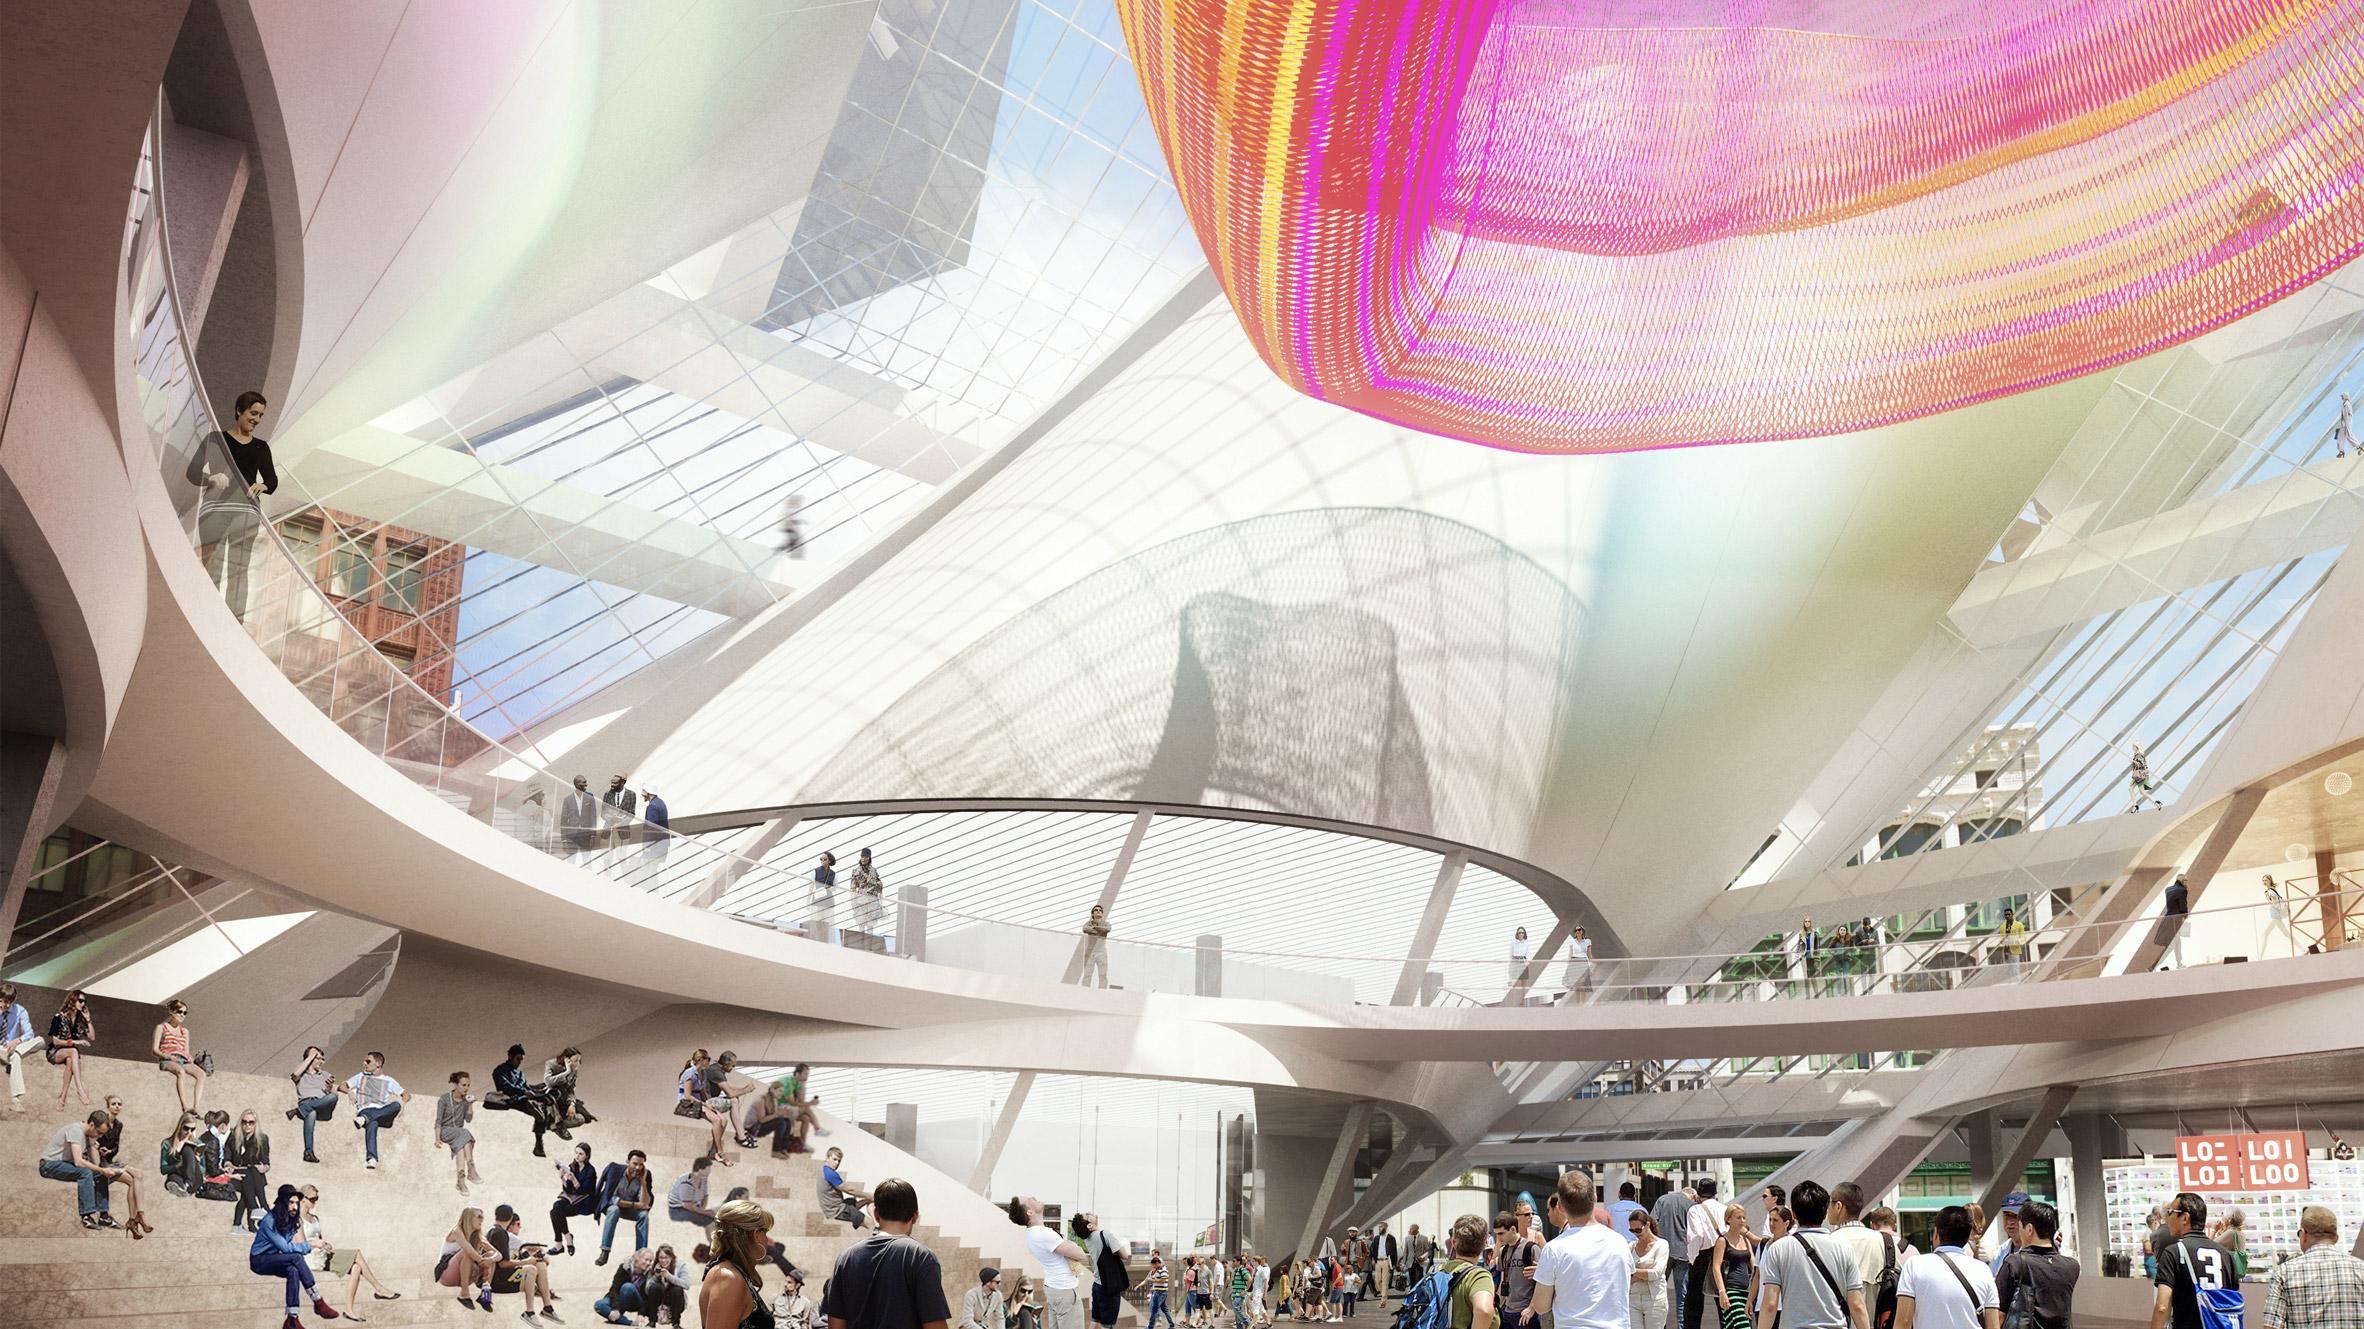 Hudson's Site Development by SHoP Architects